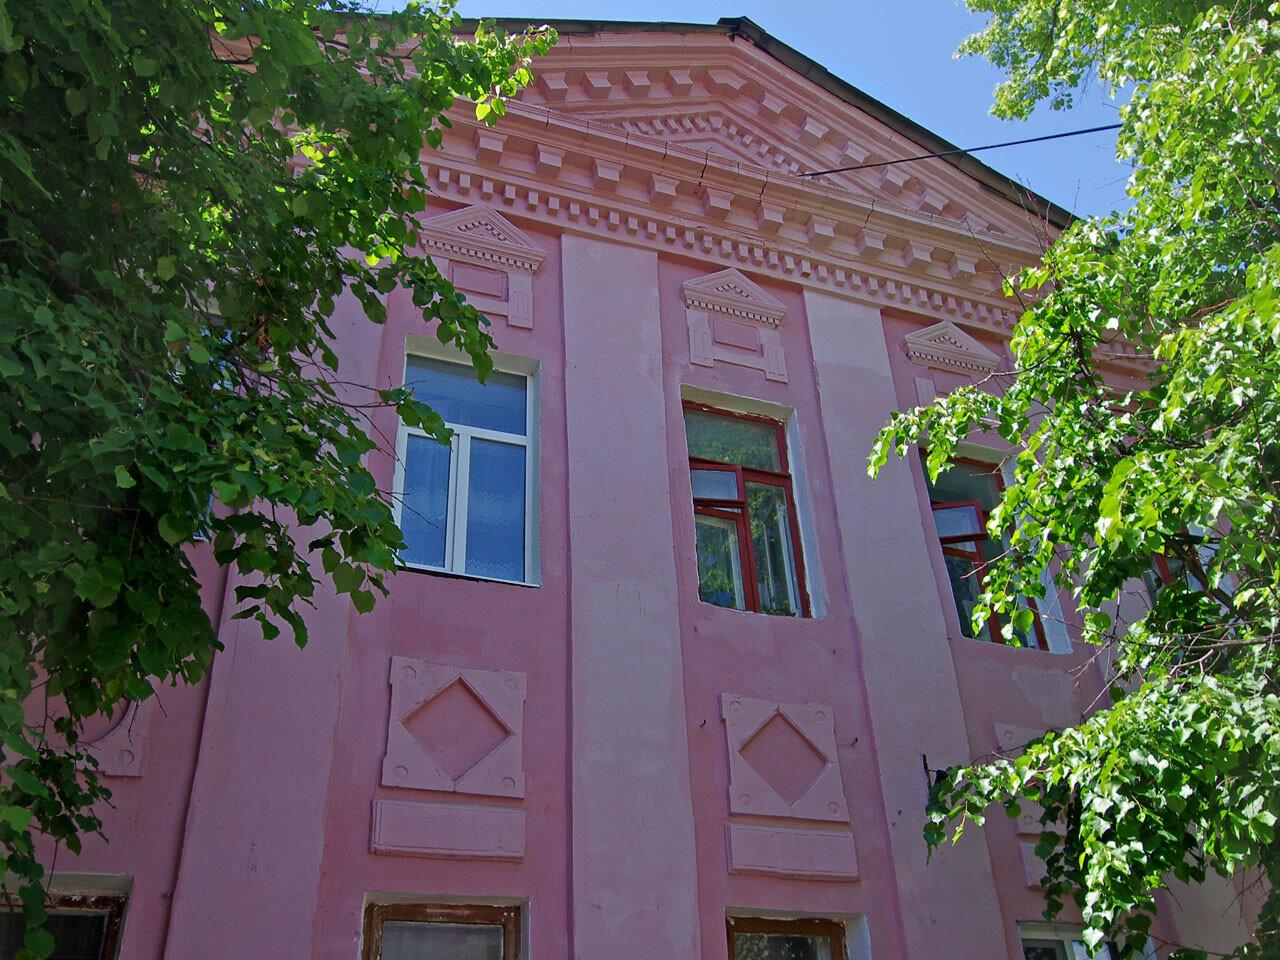 По улицам Зарайска. Автор фото: Юрий Семенов